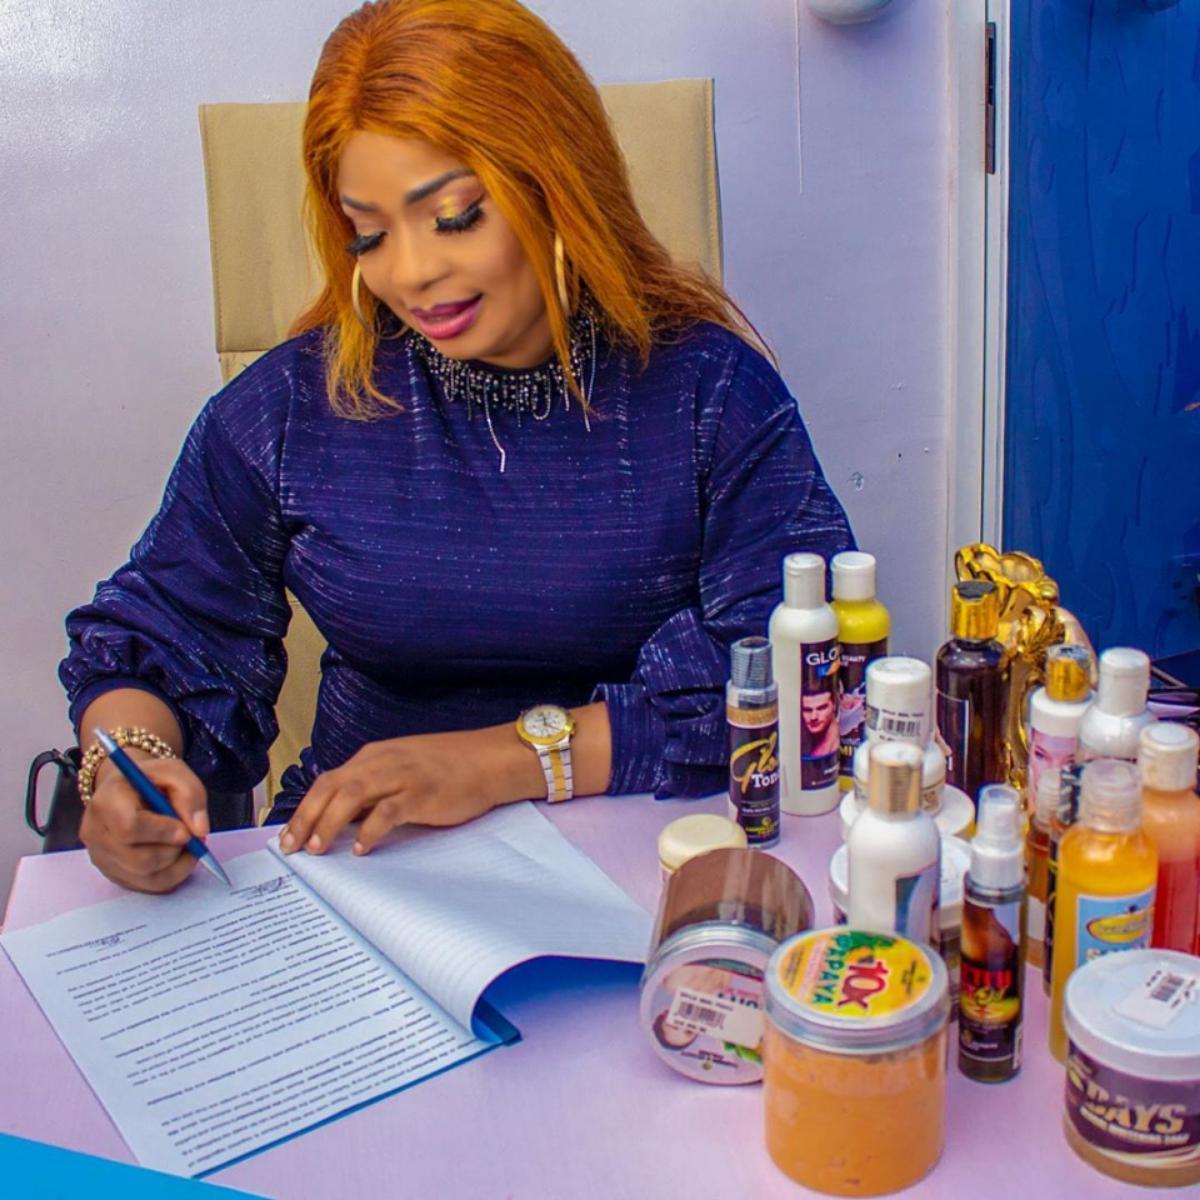 Laide Bakare Beautification Endorsement Deal